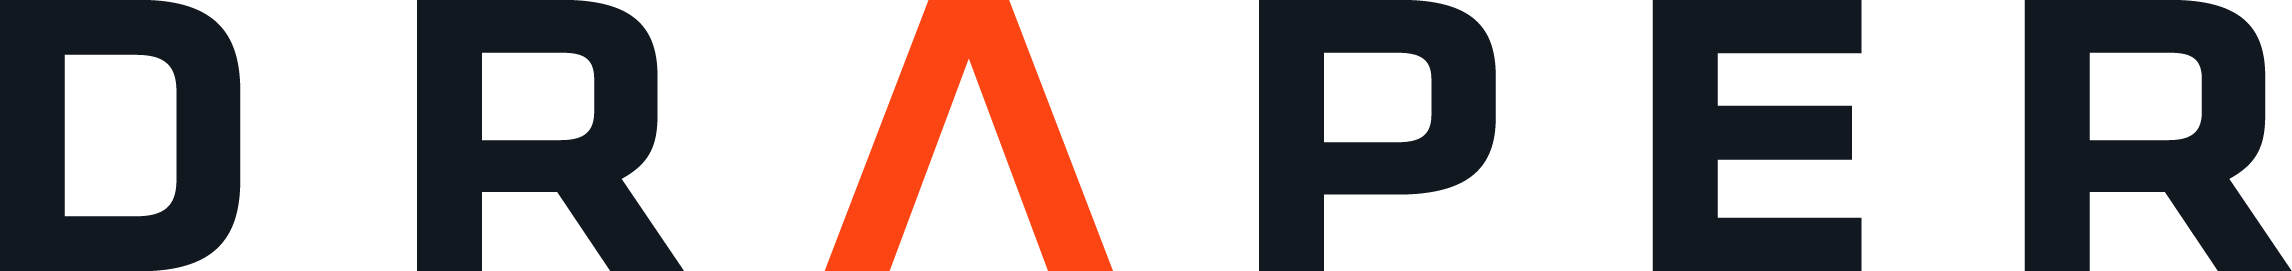 Draper Laboratory logo.png